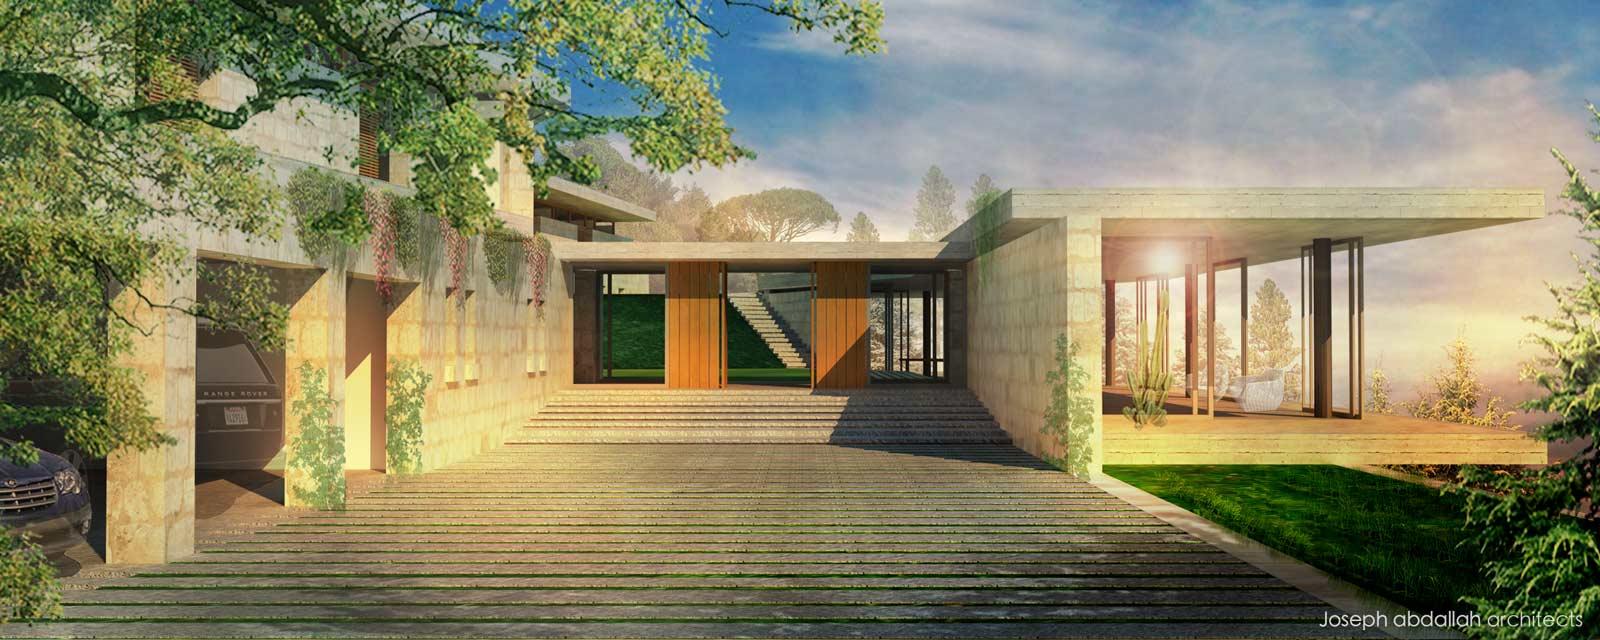 bakhos-nassif-eagle-nest-villa-lebanon-joseph-abdallah-architects-1